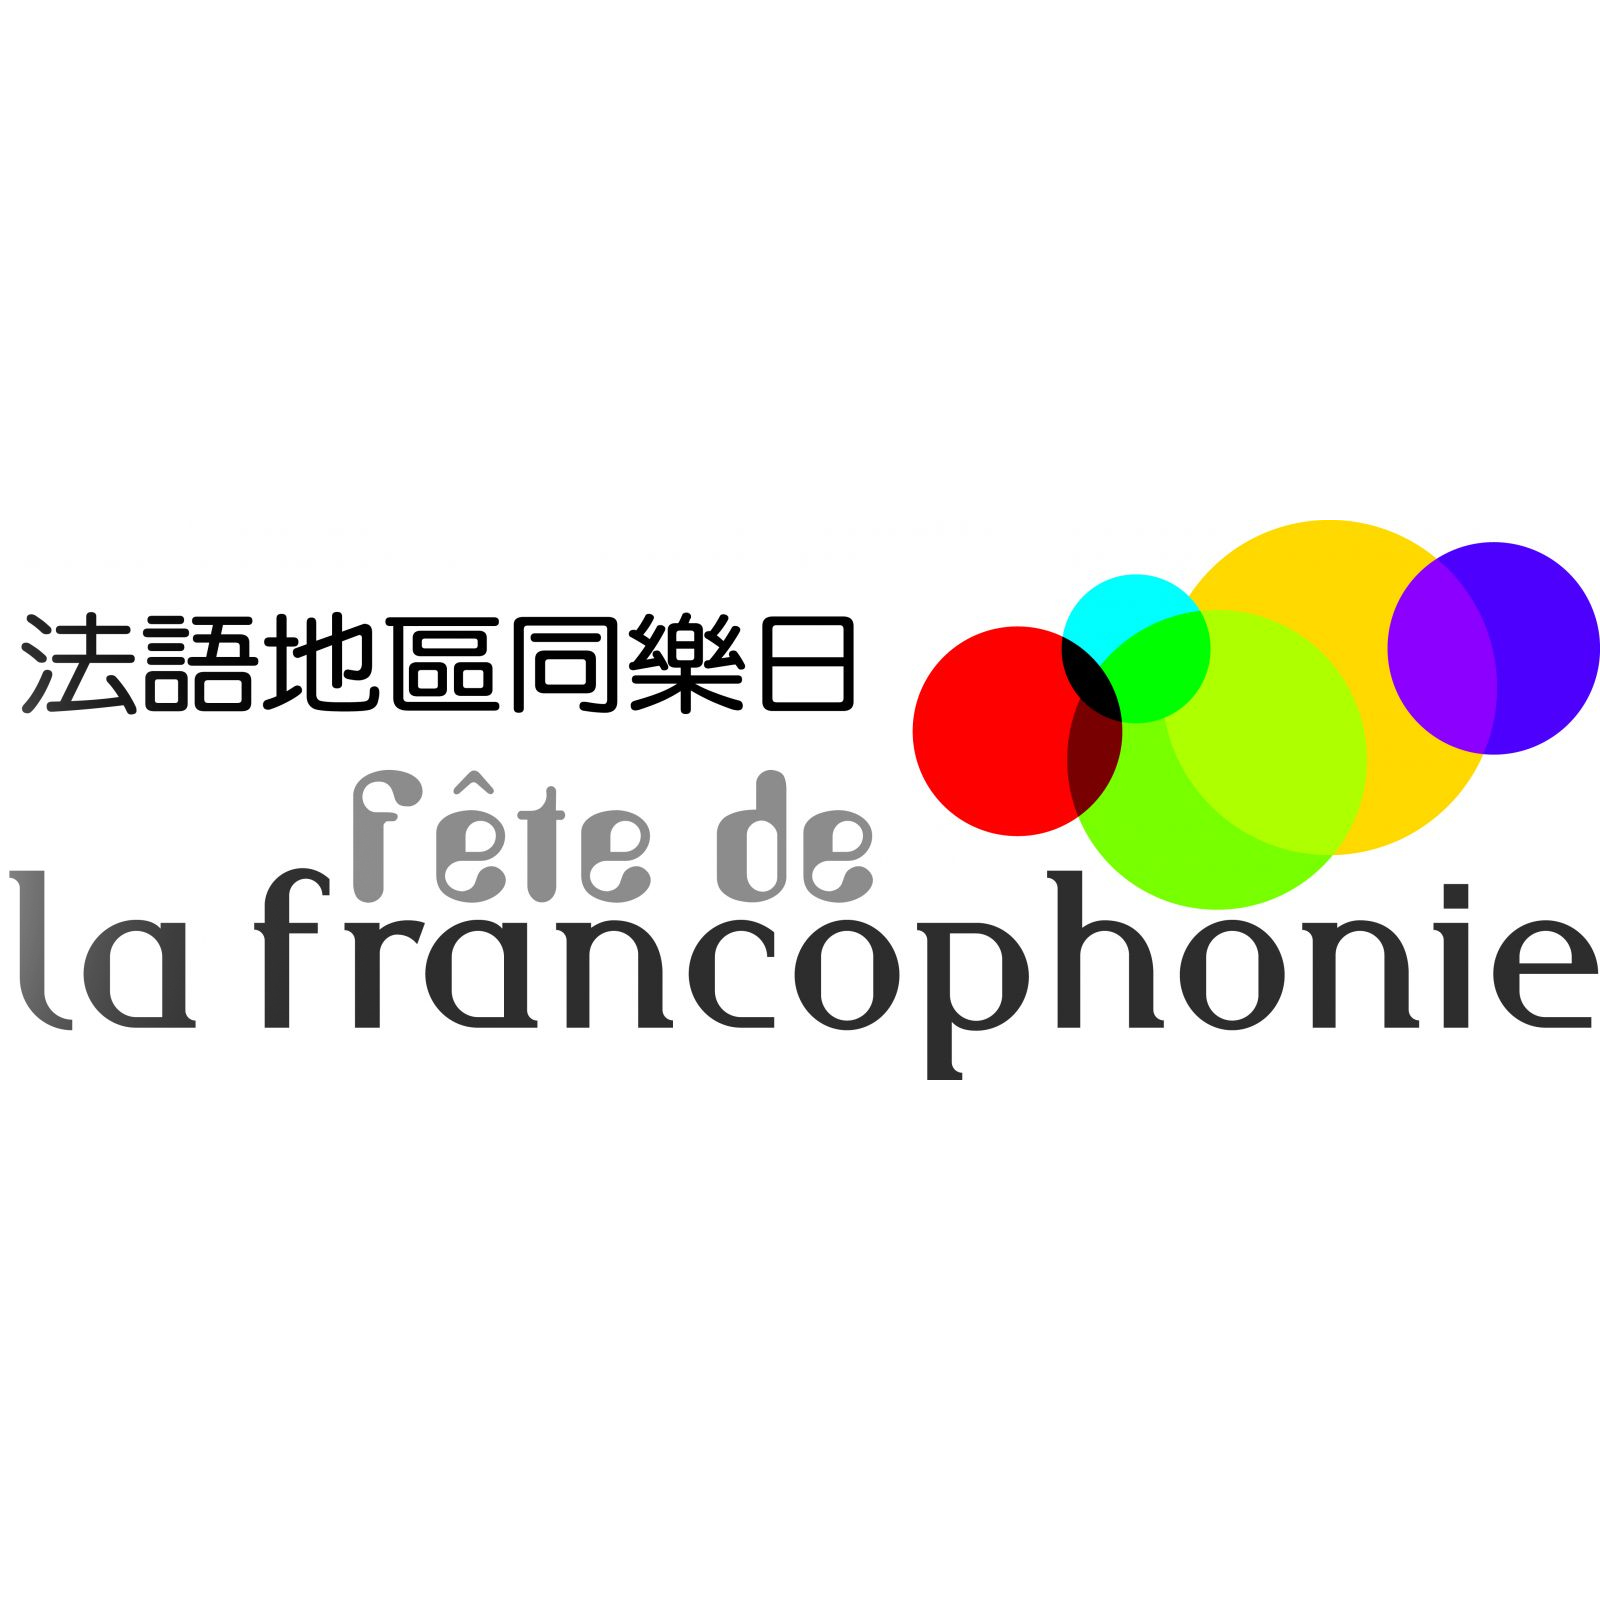 logo of festival of francohpnie